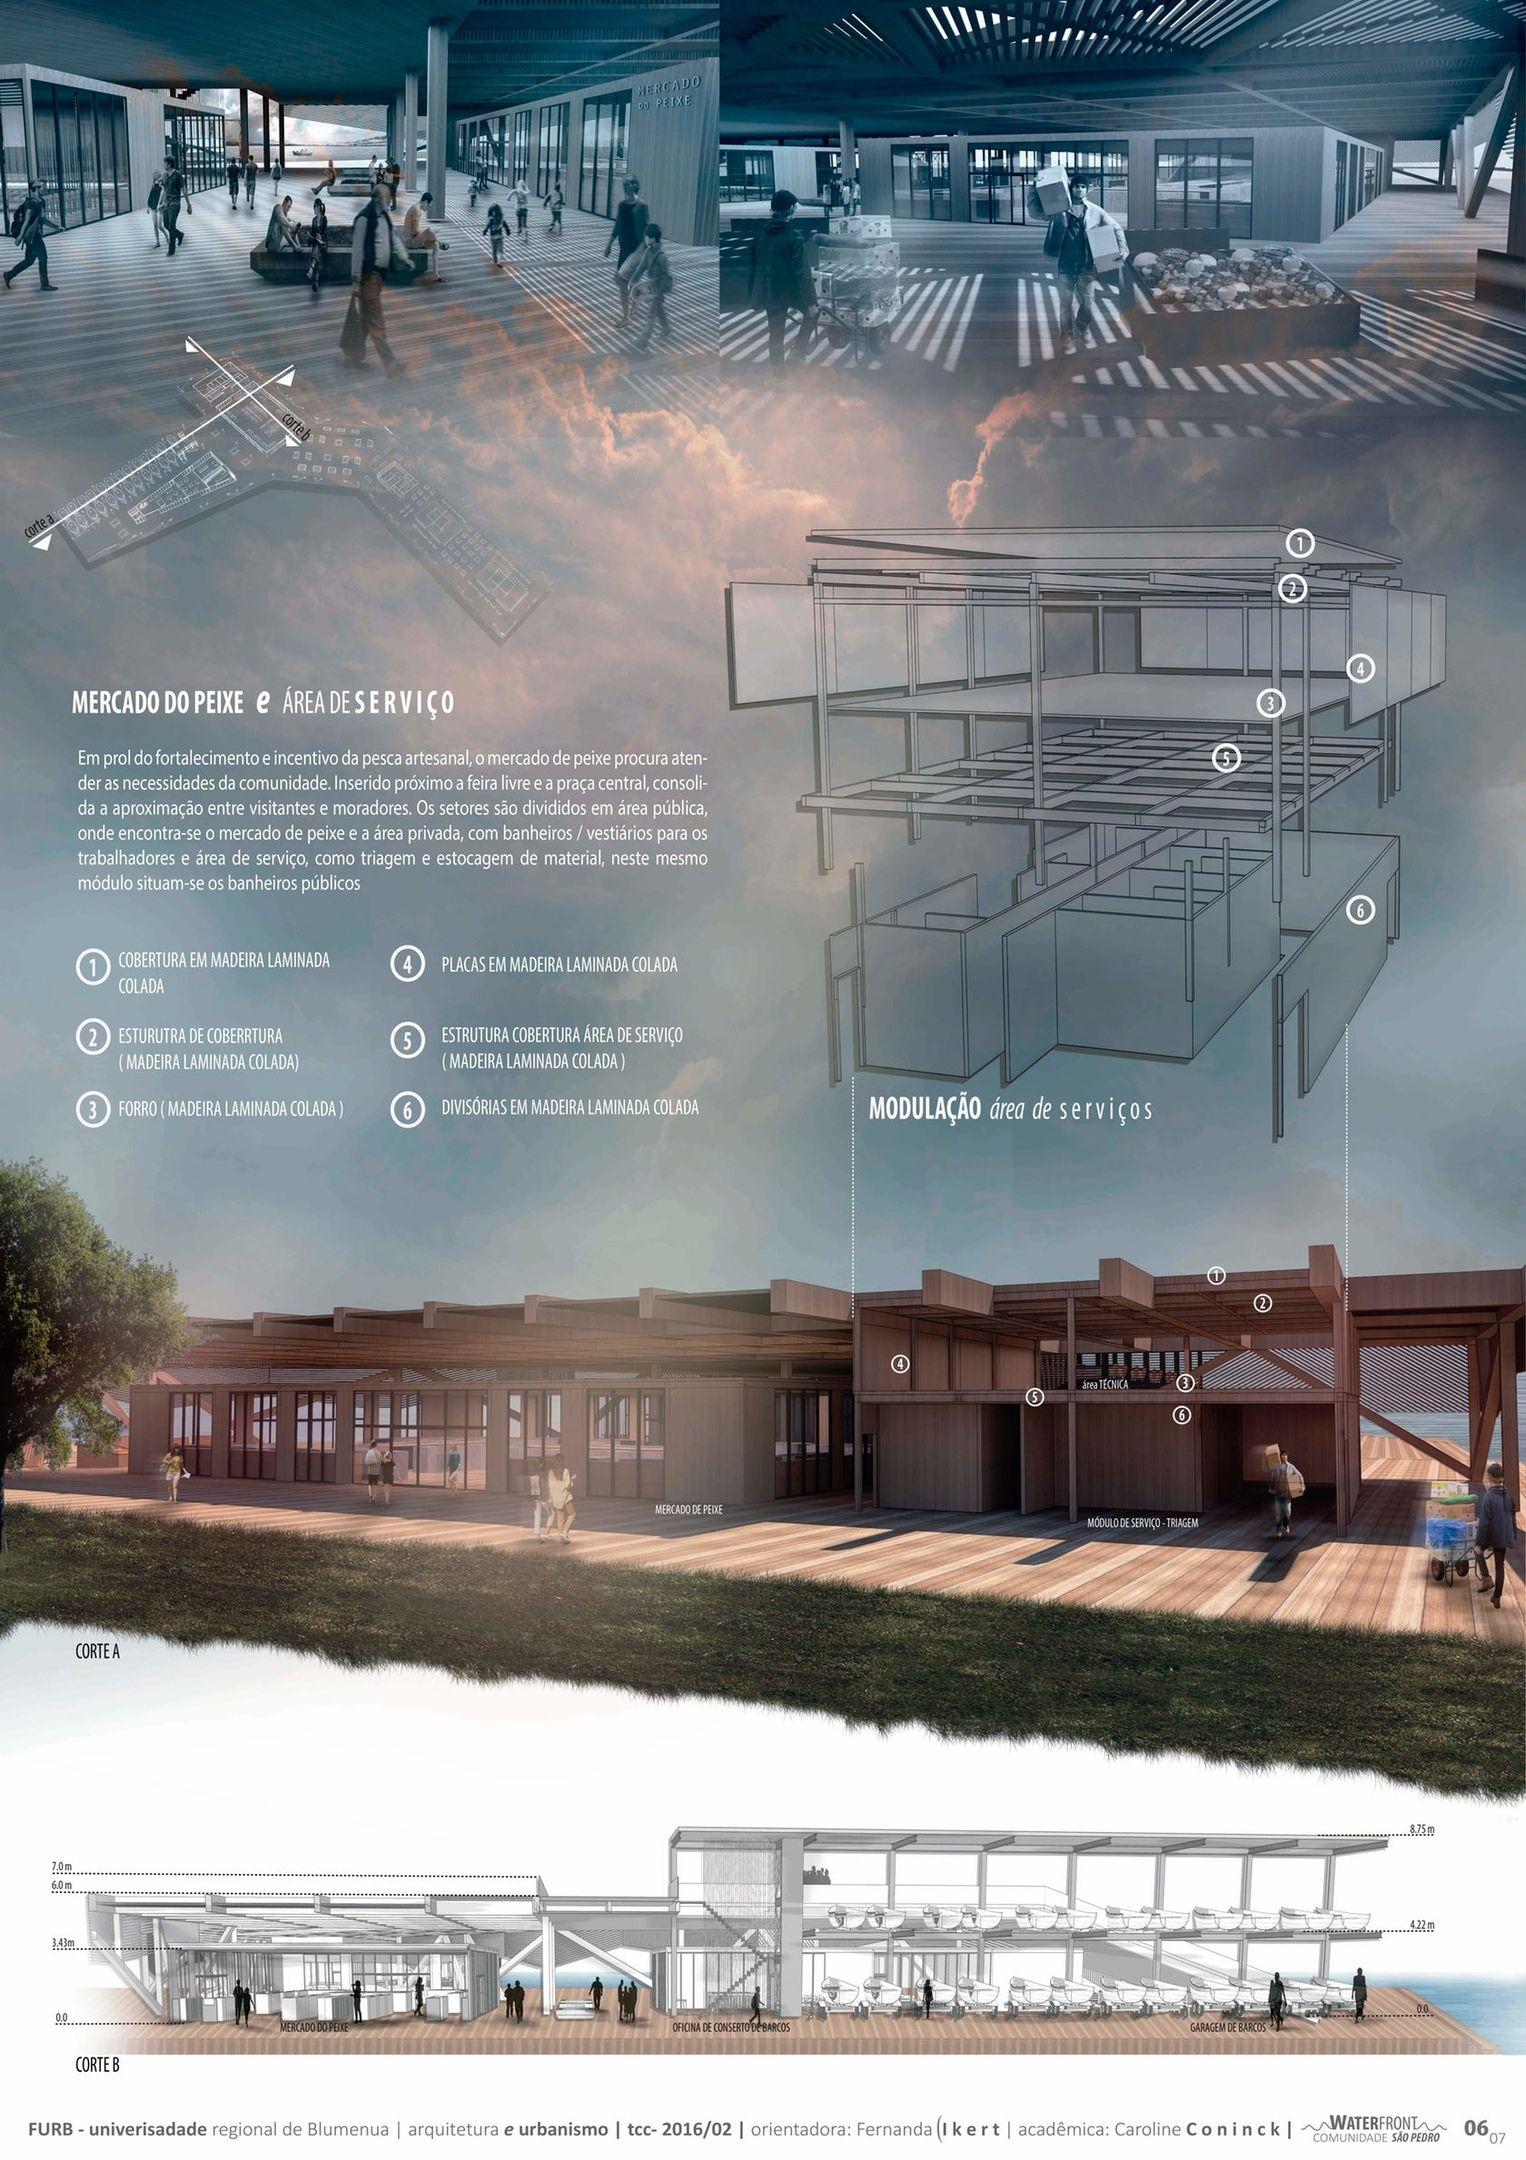 ArchBlog | Архитектура | presentation | Architecture panel